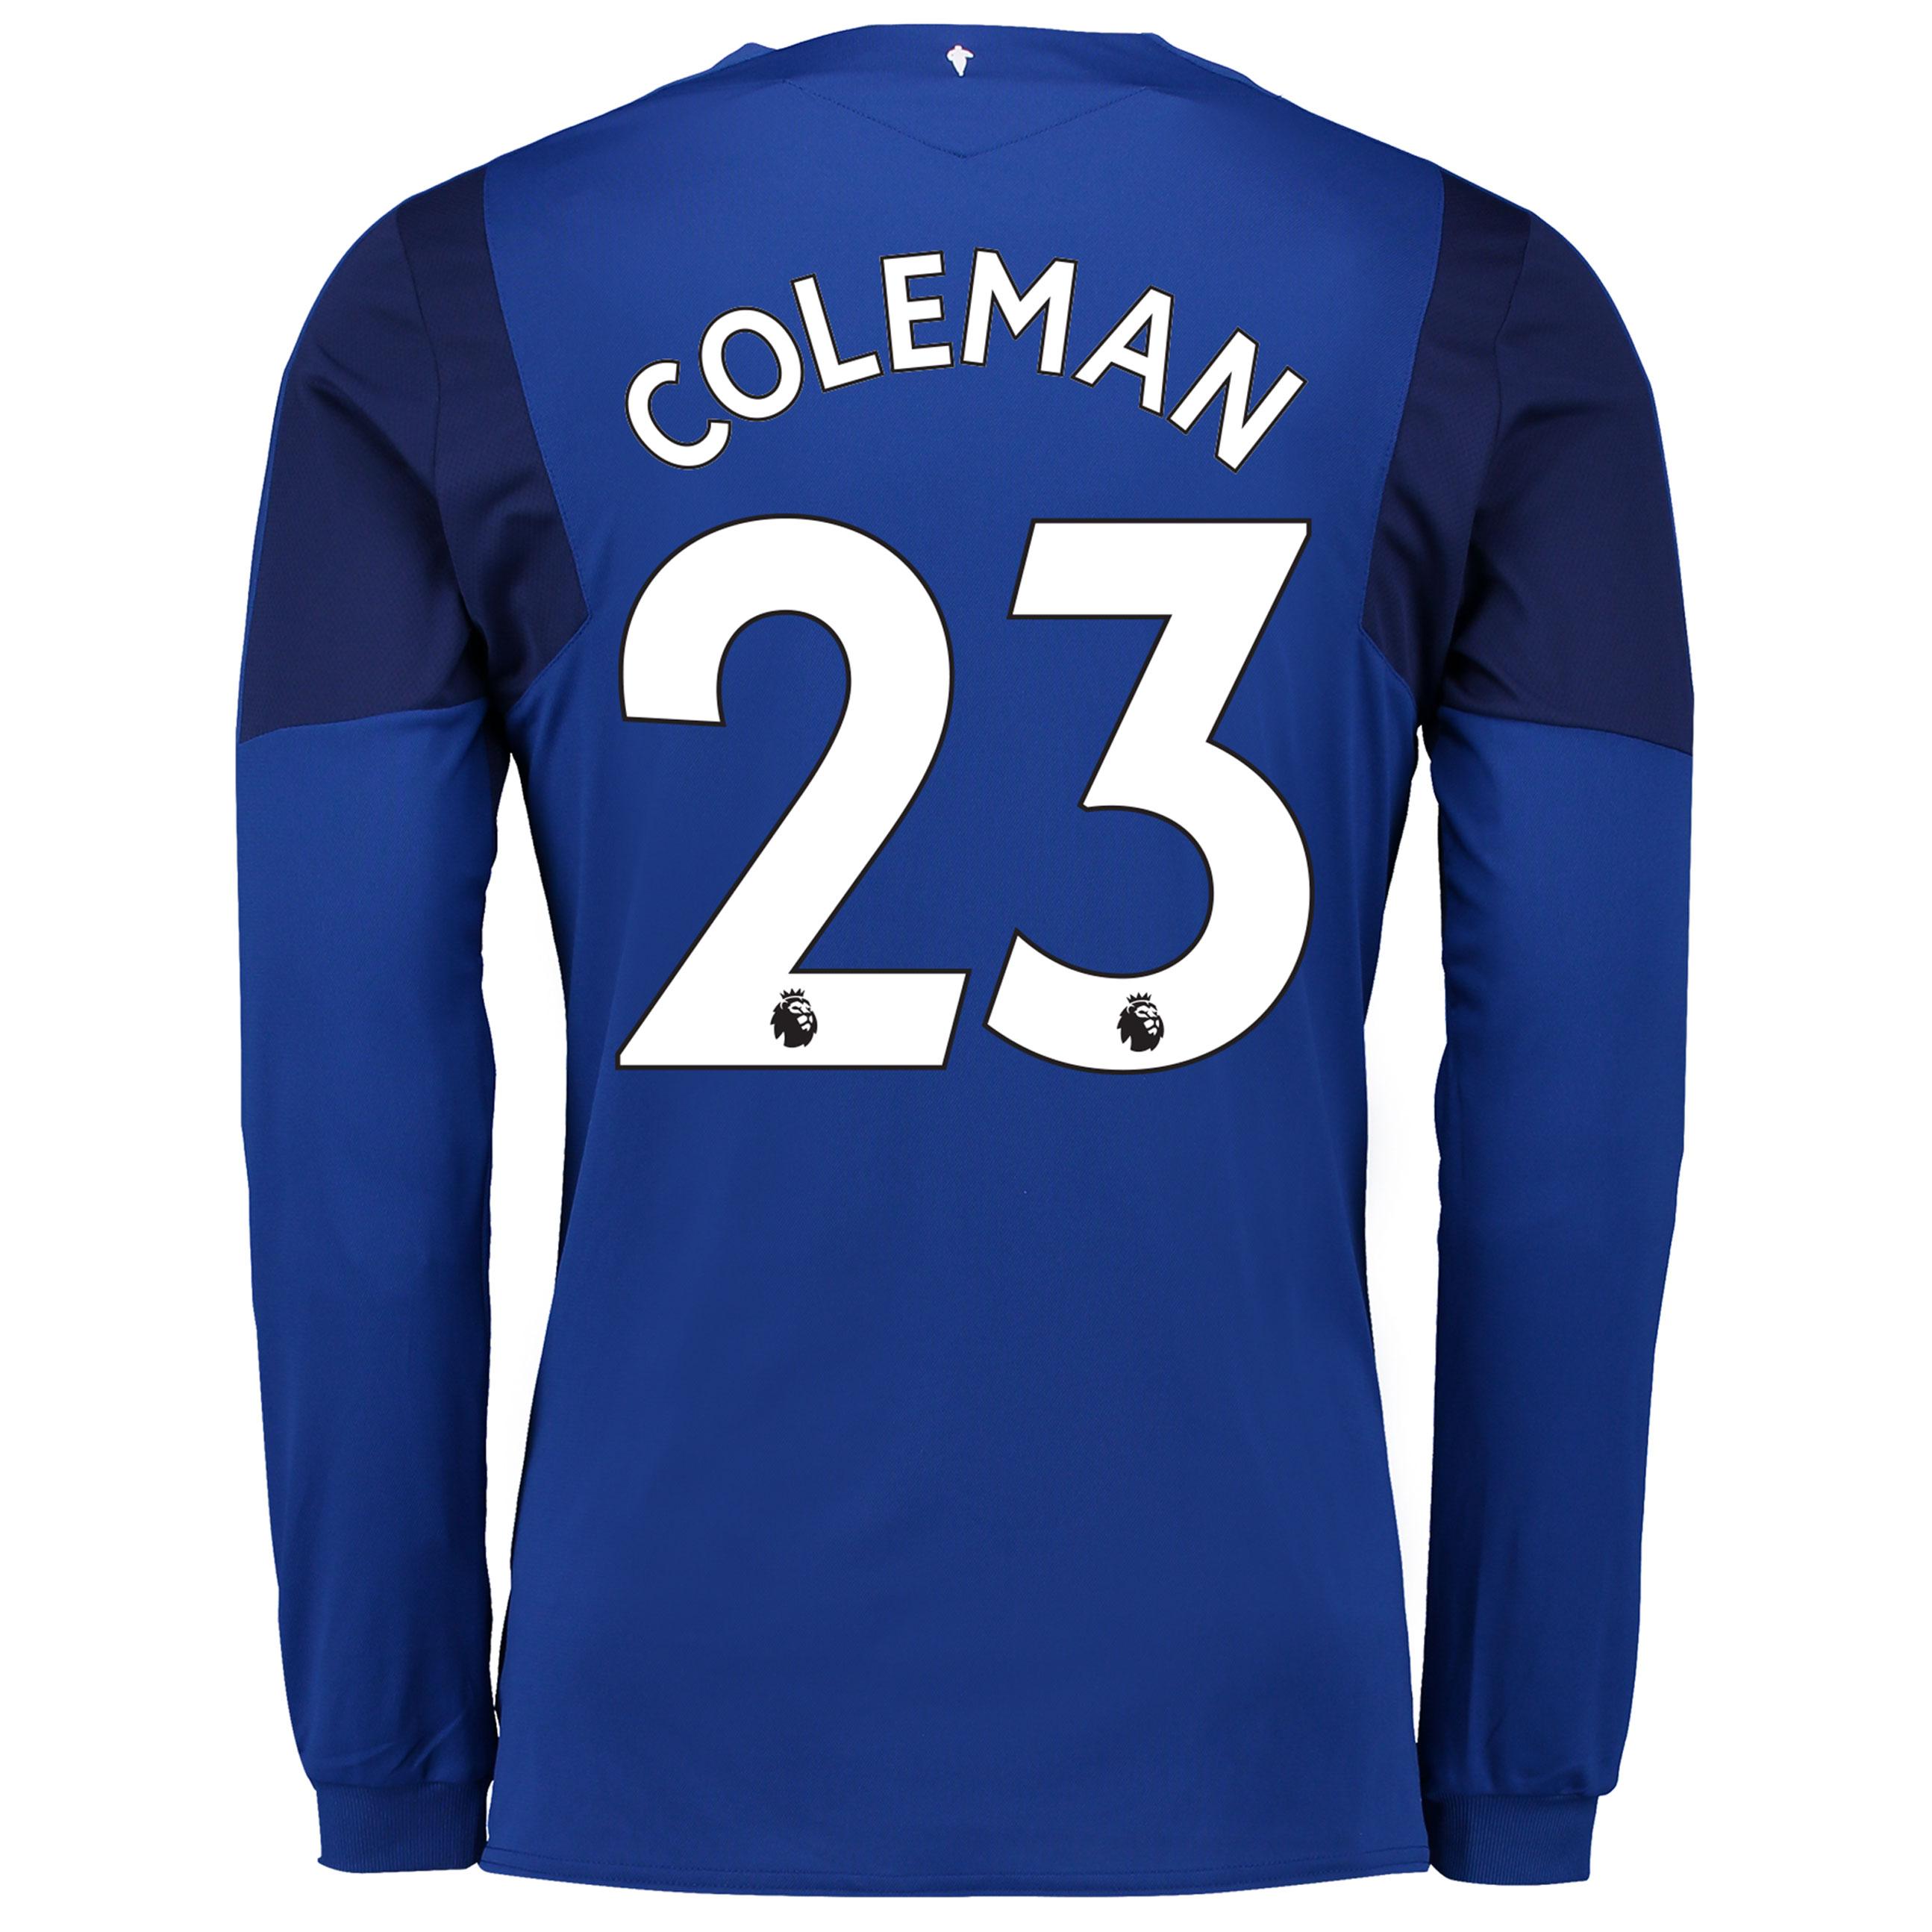 Everton Home Shirt 2017/18 - Junior - Long Sleeved with Coleman 23 pri